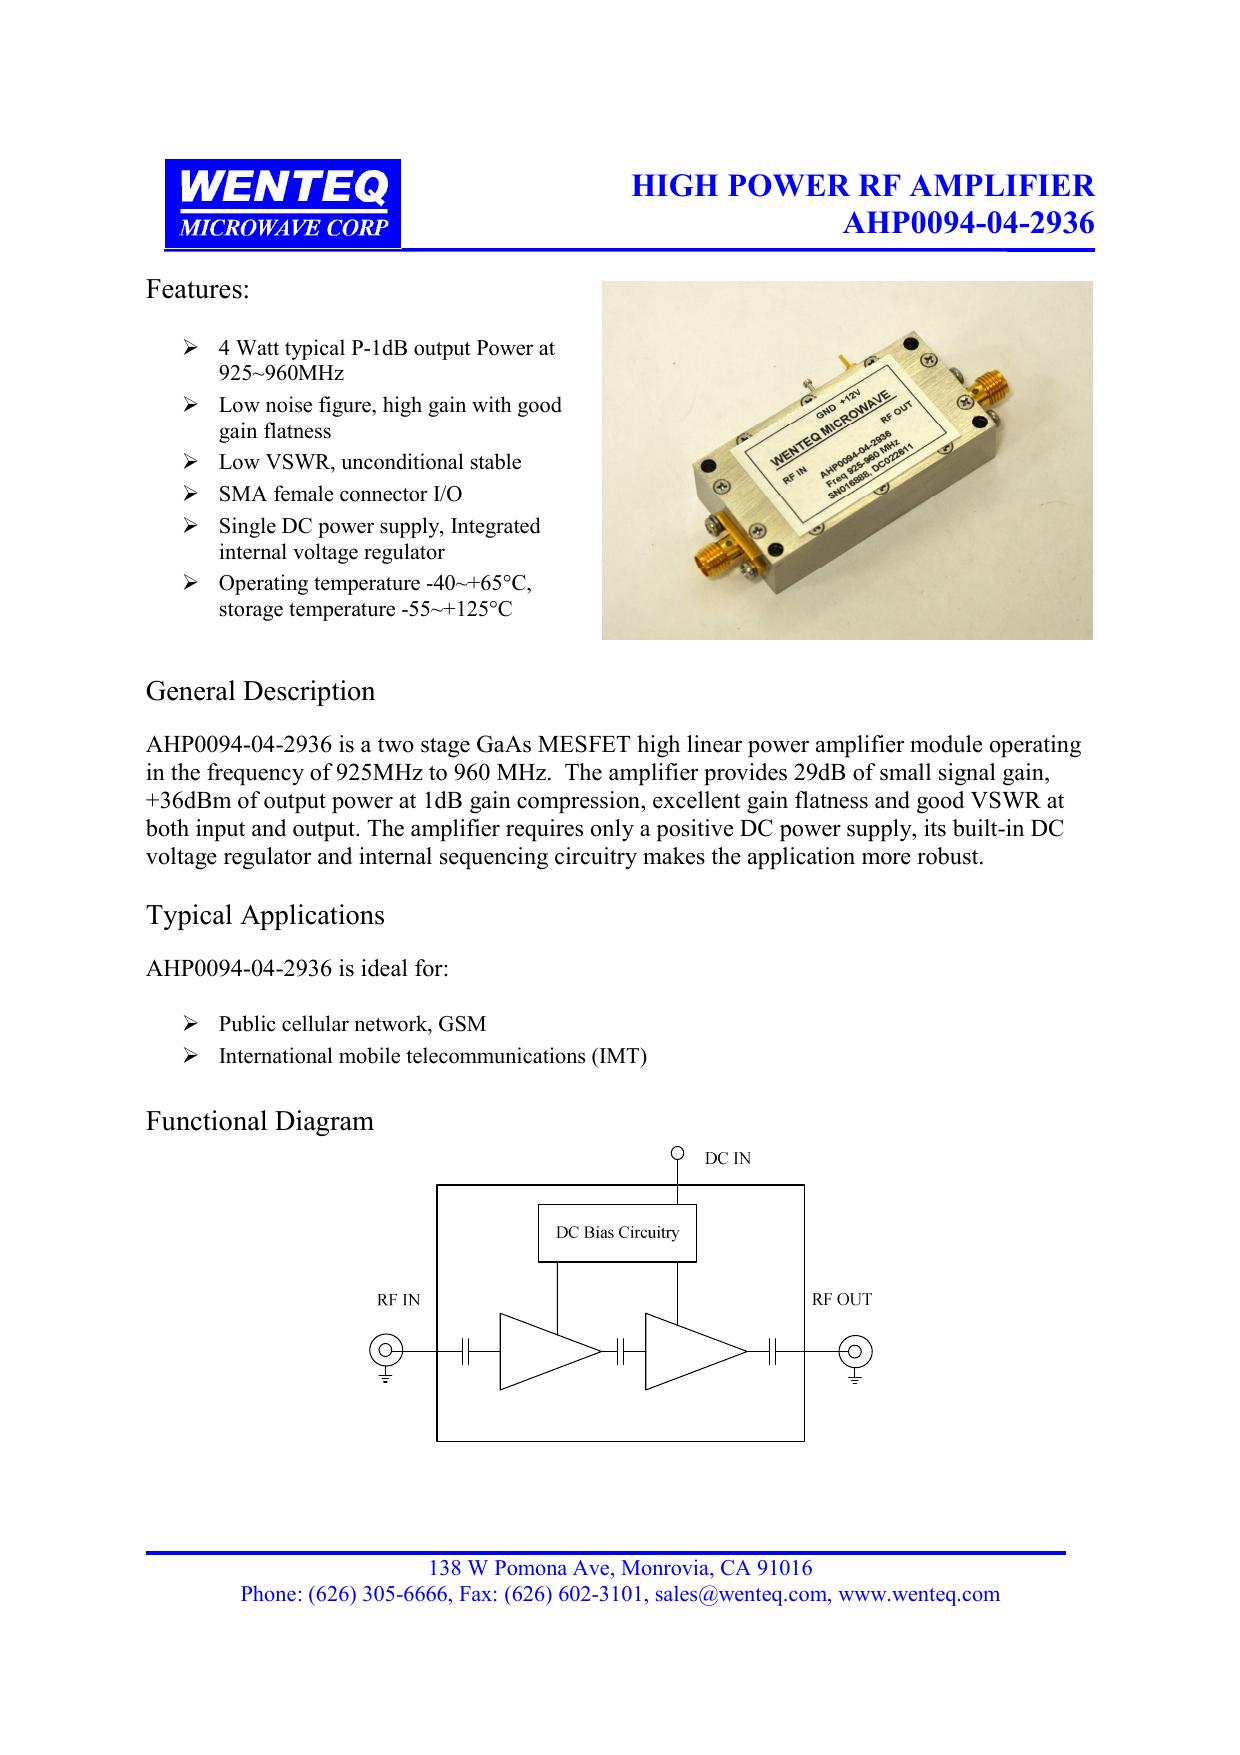 high power rf amplifier ahp0094-04-2936 | manualzz com